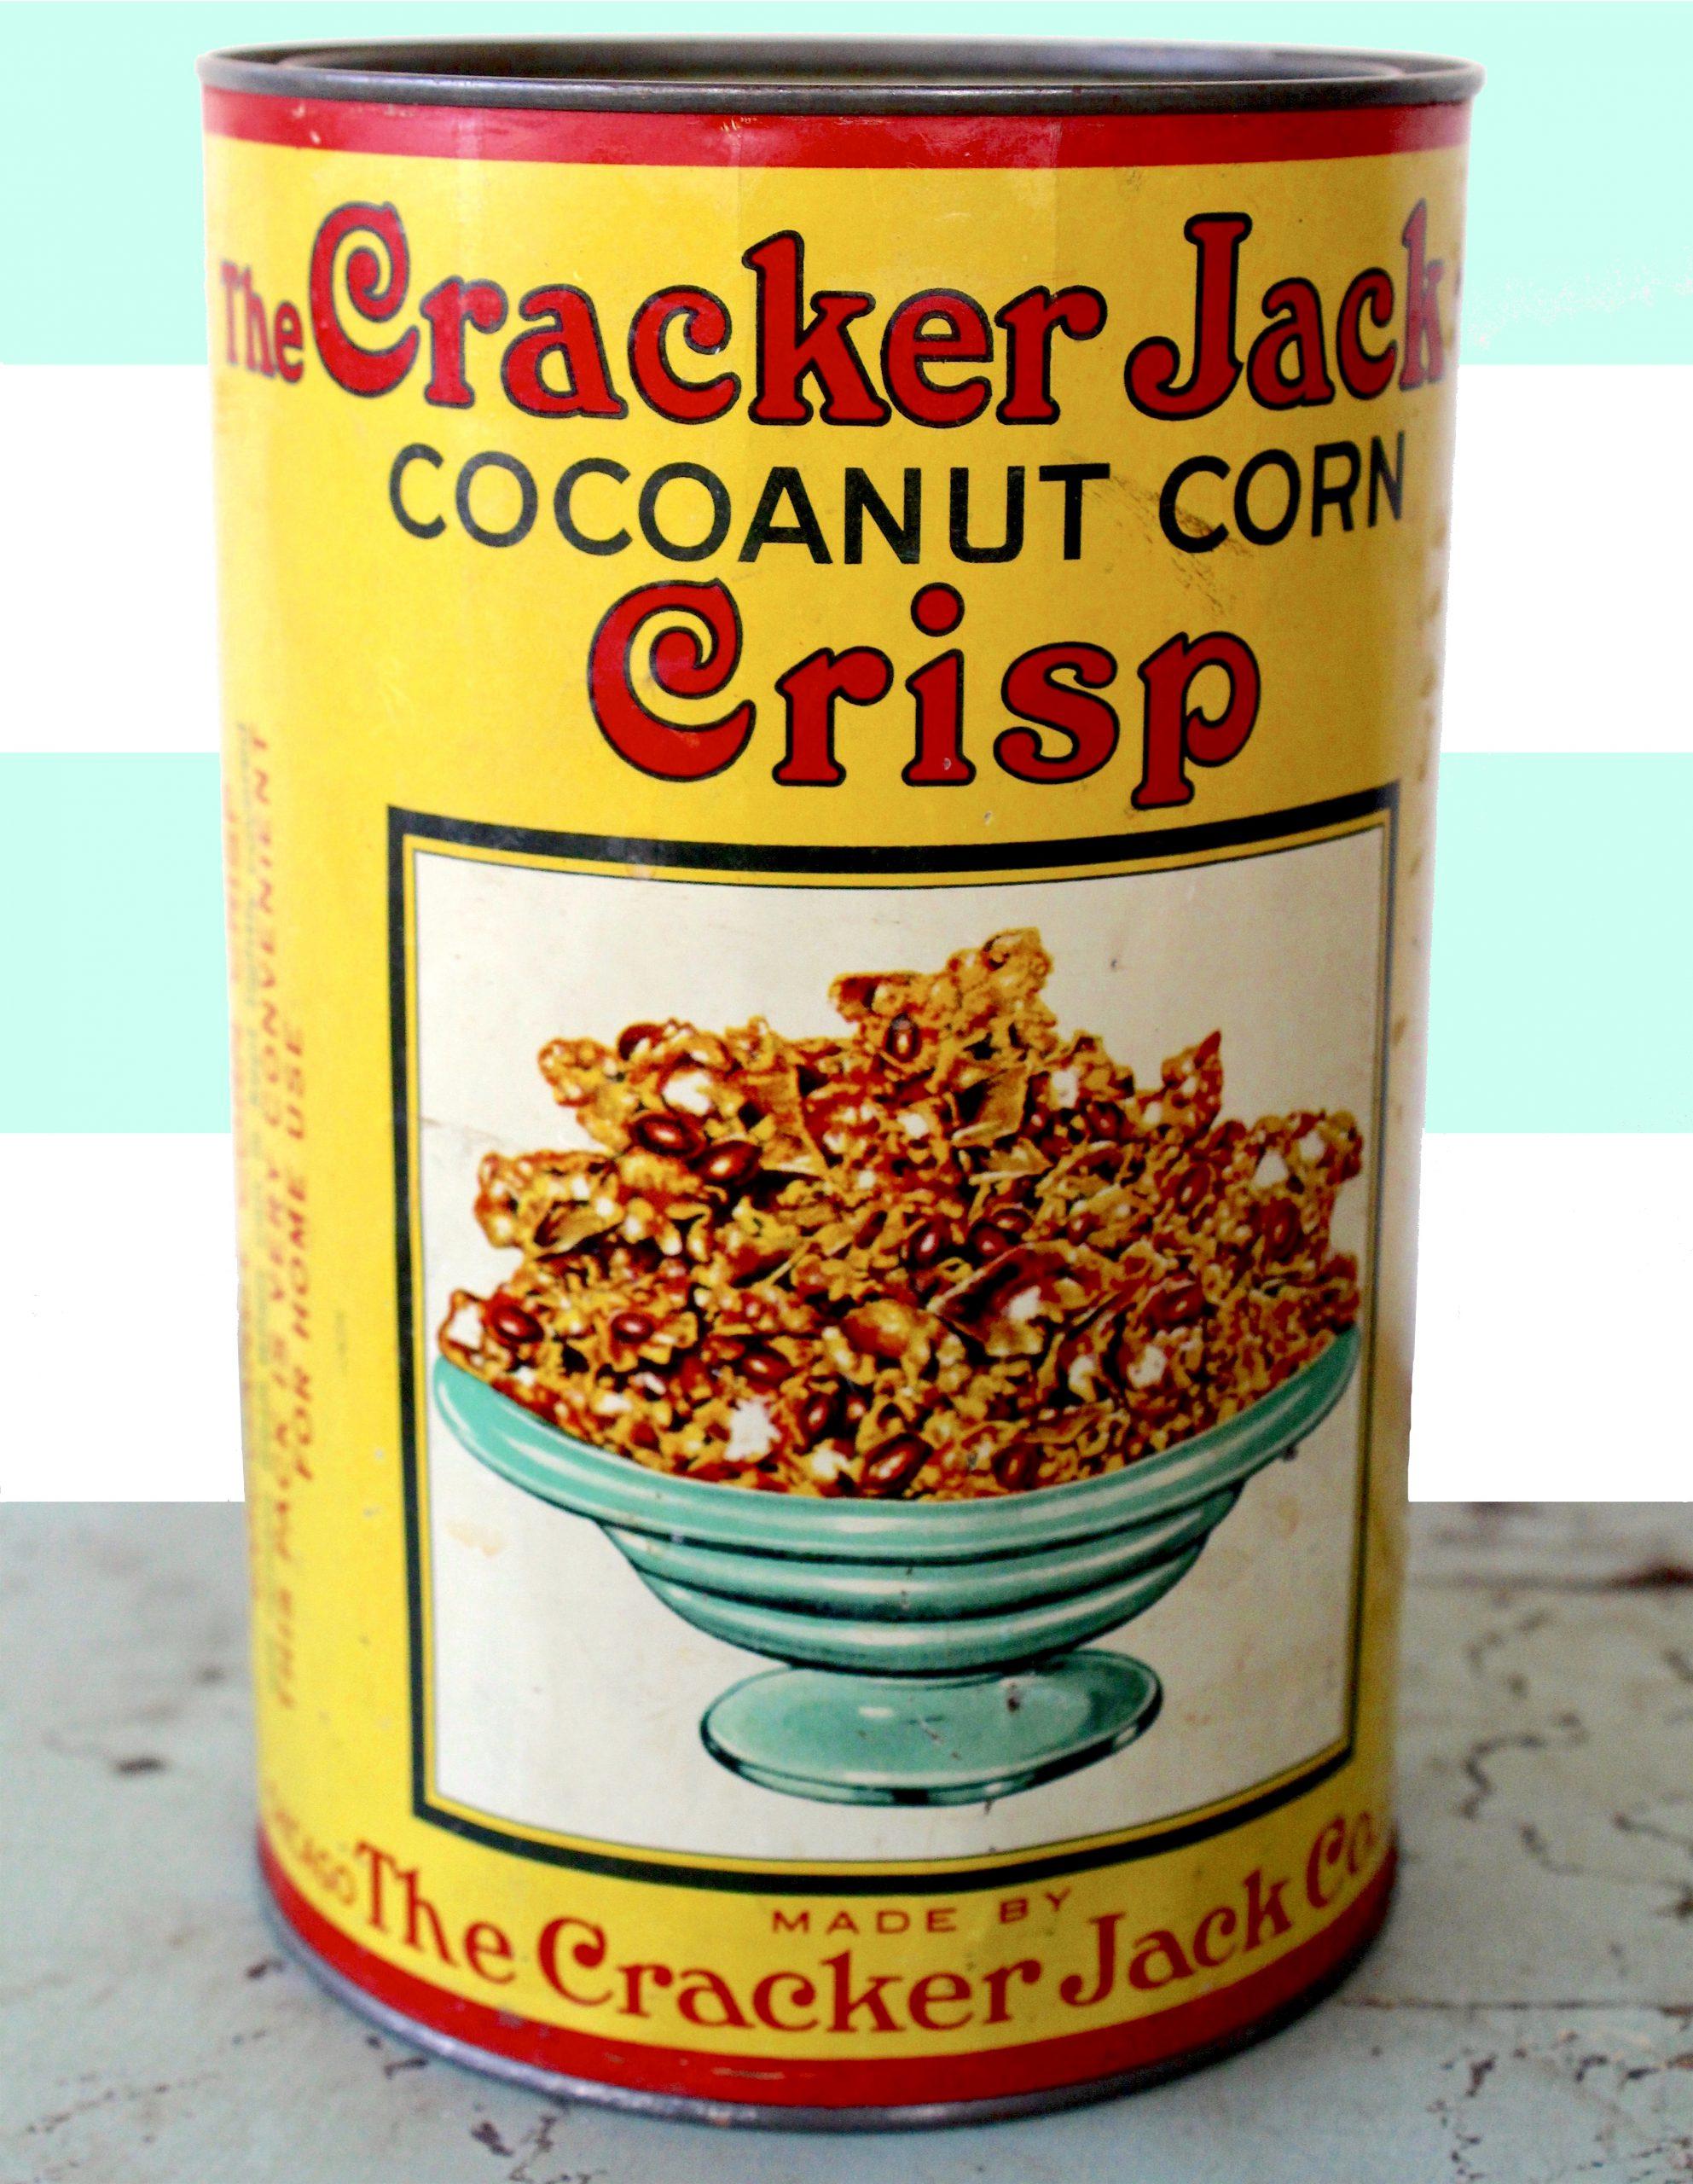 Cracker Jack History - Cocoanut Corn Crisp